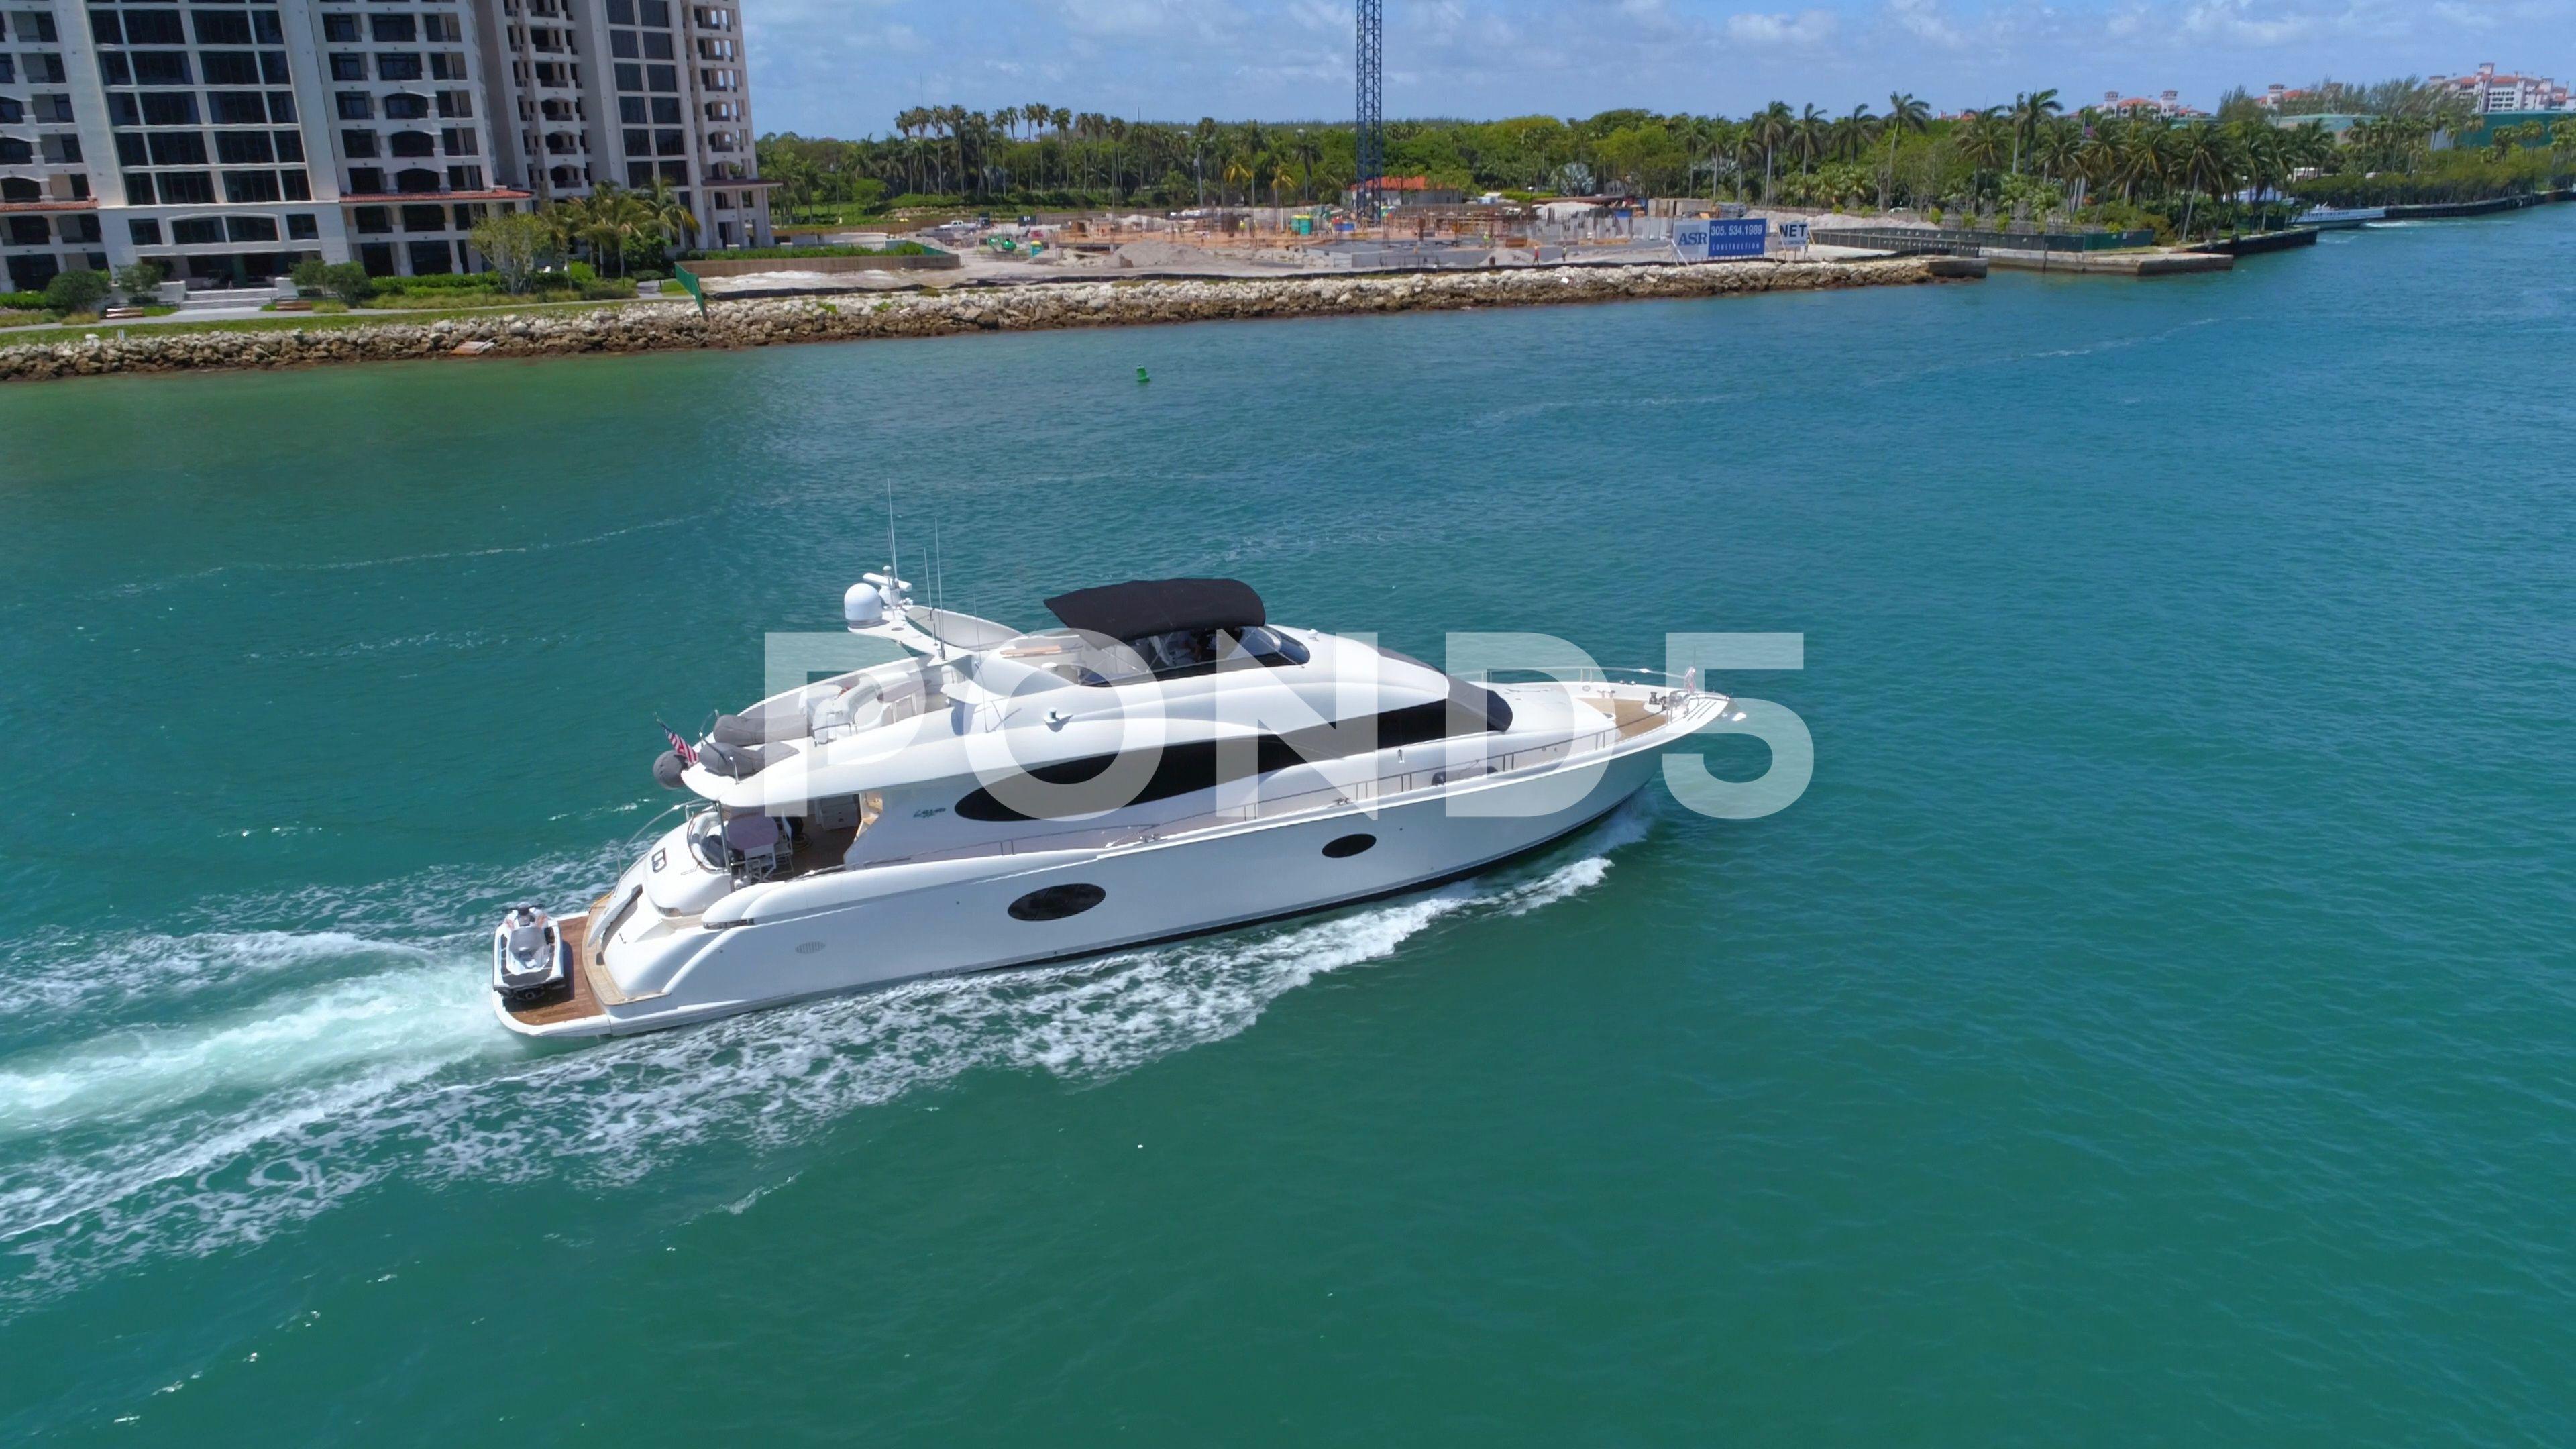 Slow Motion Drone Aerial Follow Luxury Yacht Miami Beach Stock